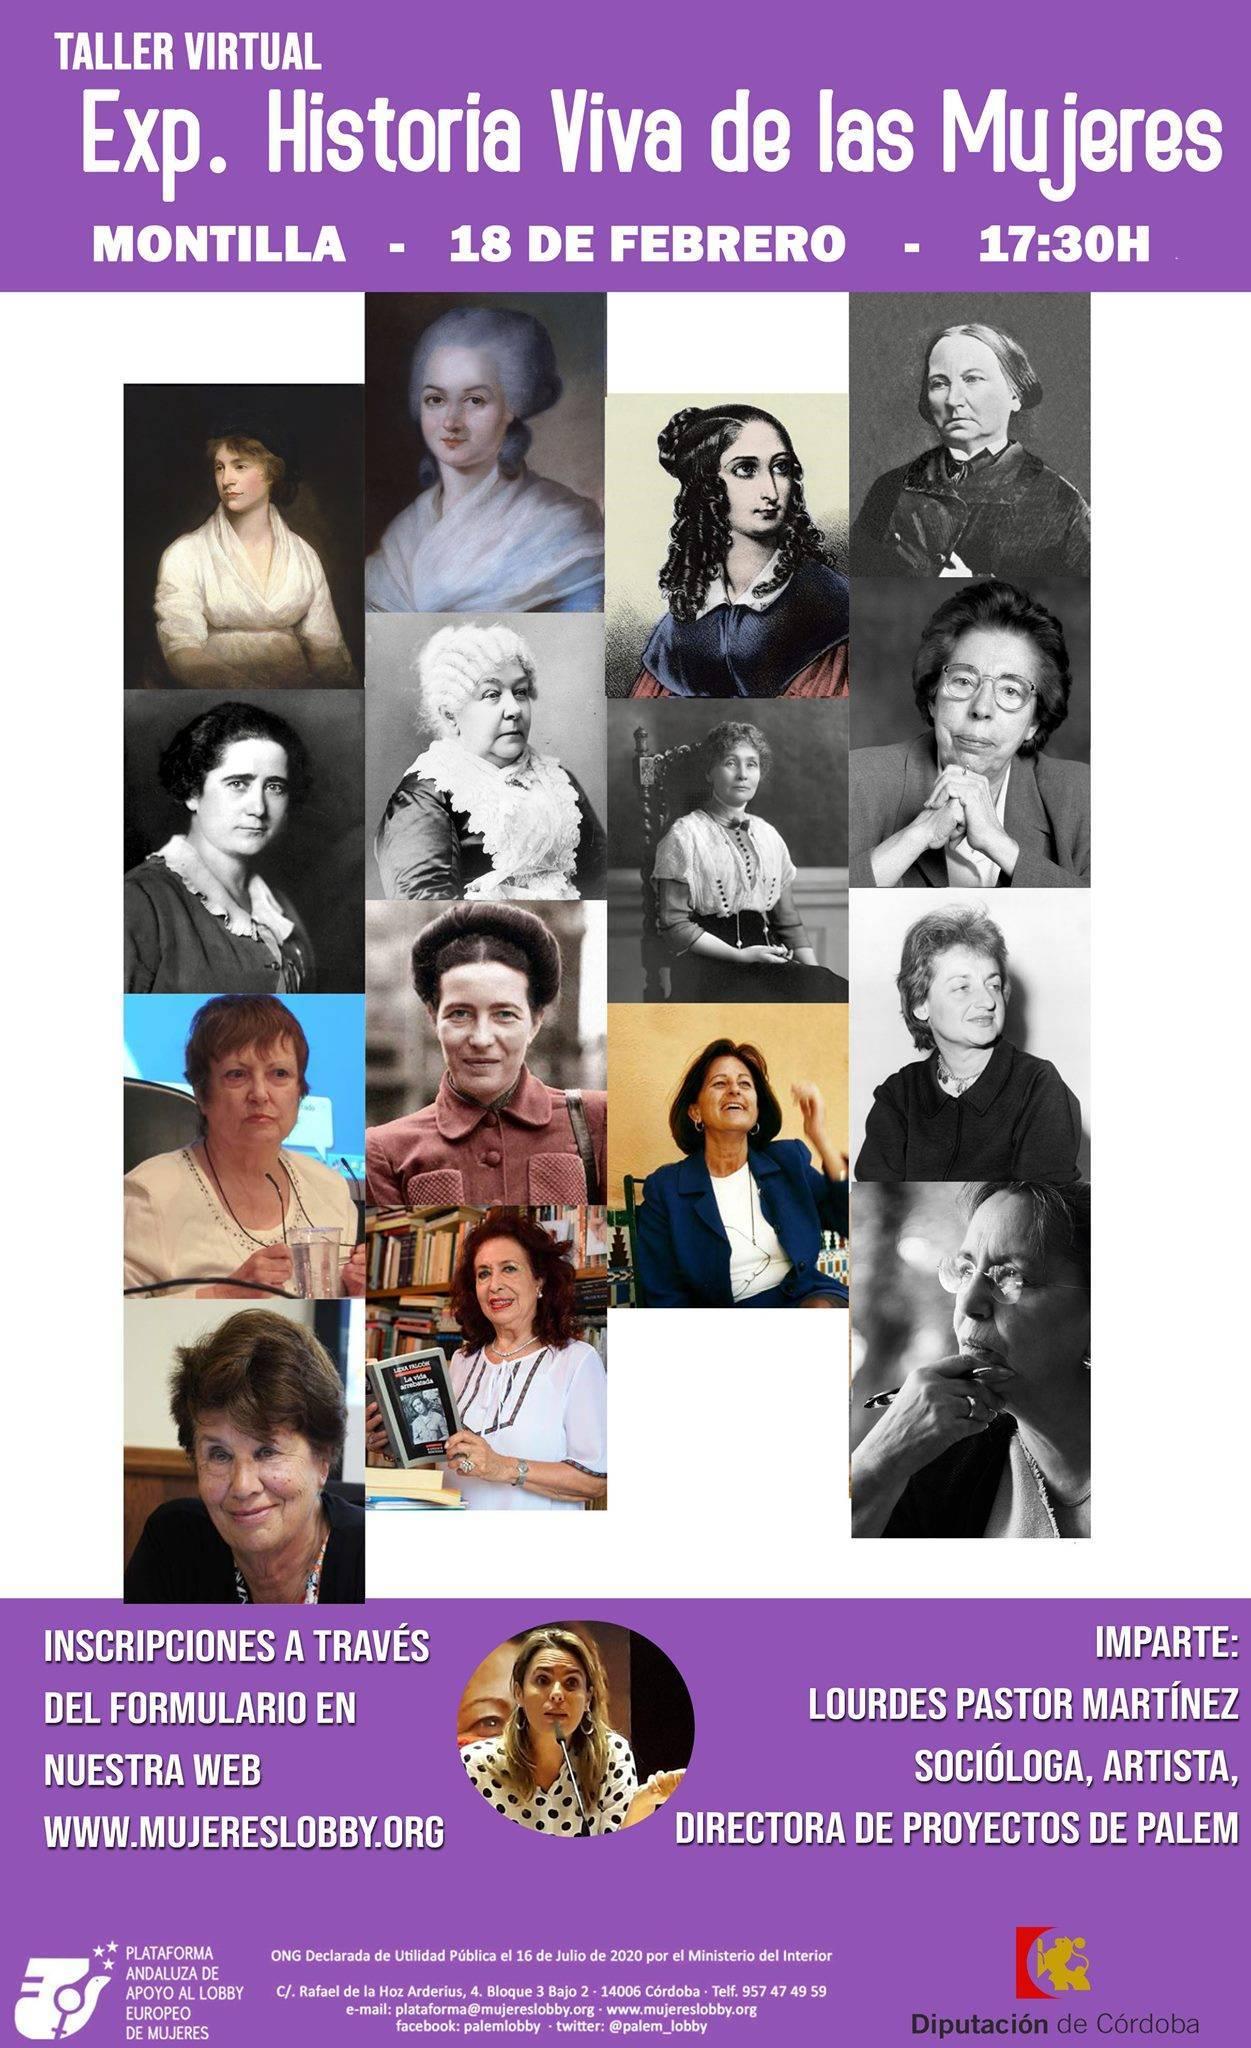 Taller de historia viva de las mujeres (2021) - Montilla (Córdoba)